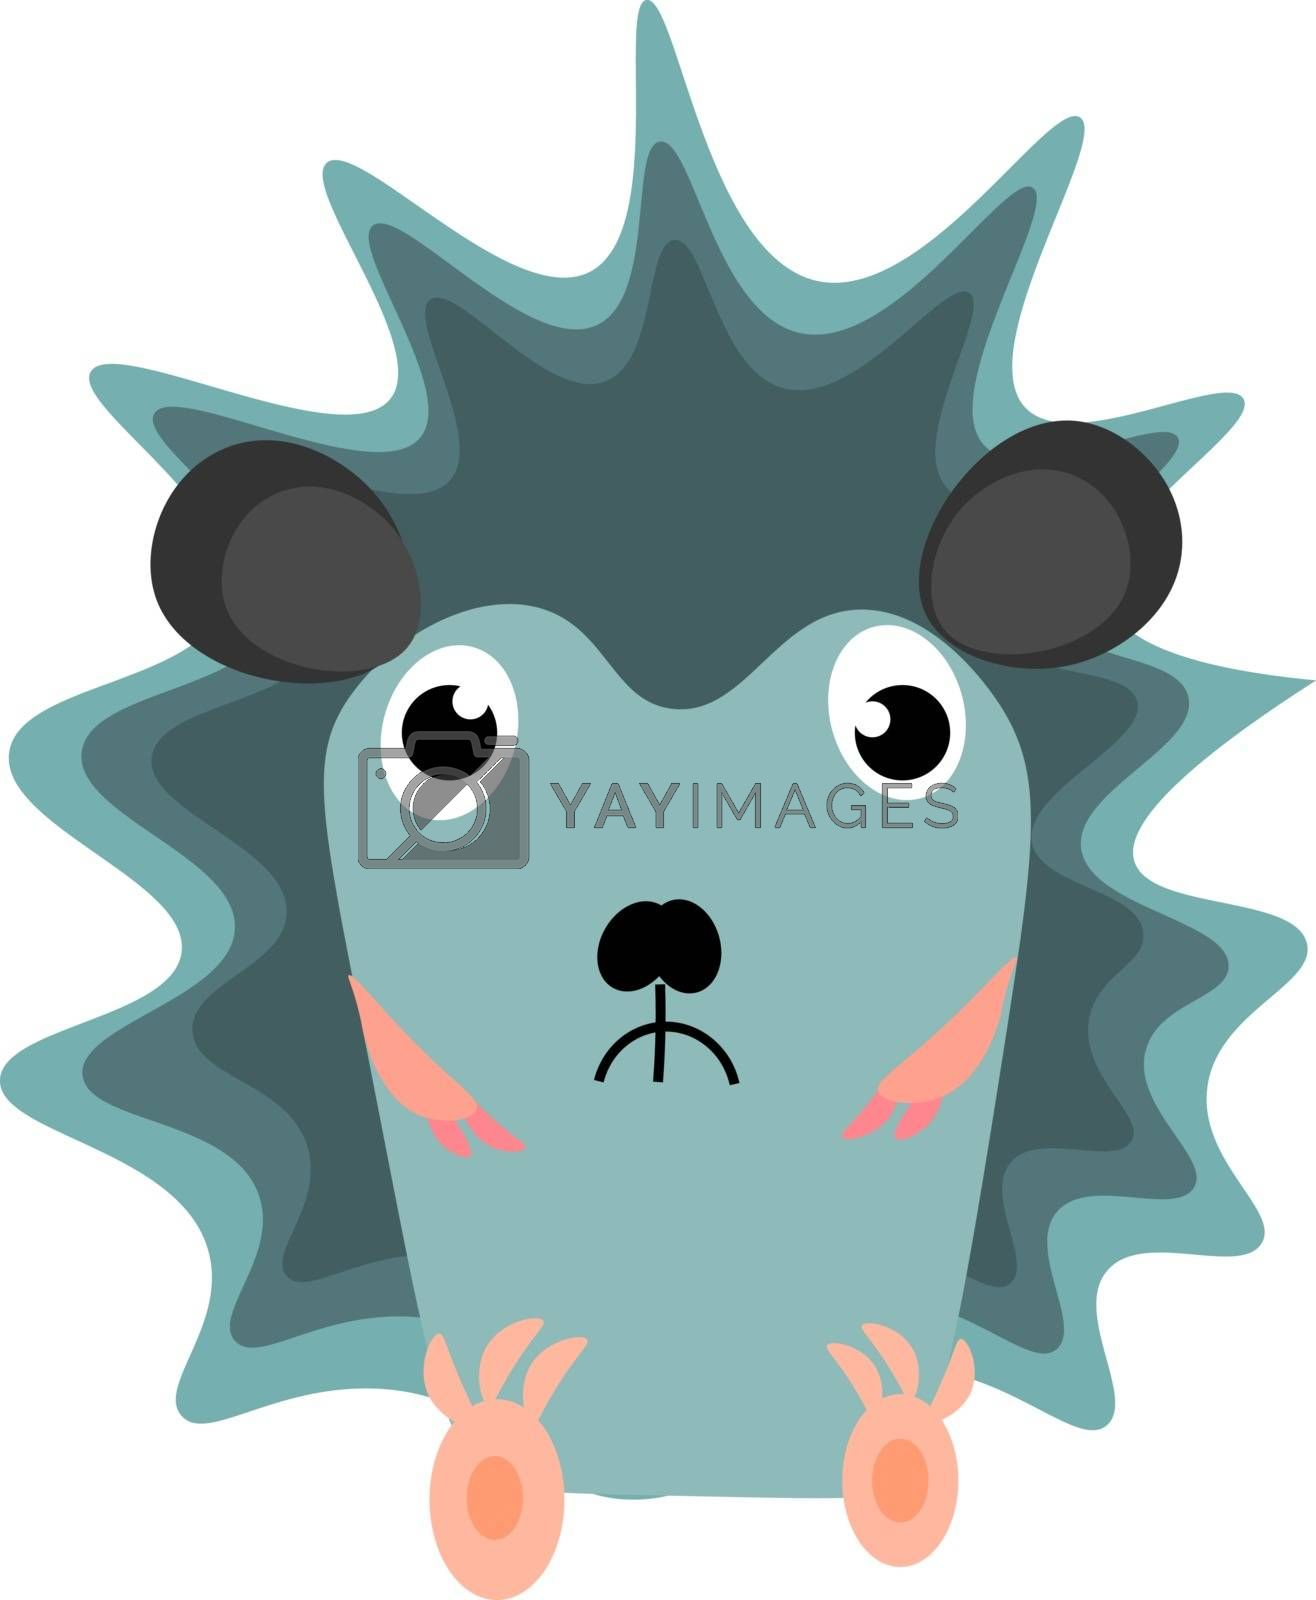 Royalty free image of Emoji of a sad blue-colored hedgehog vector or color illustratio by Morphart